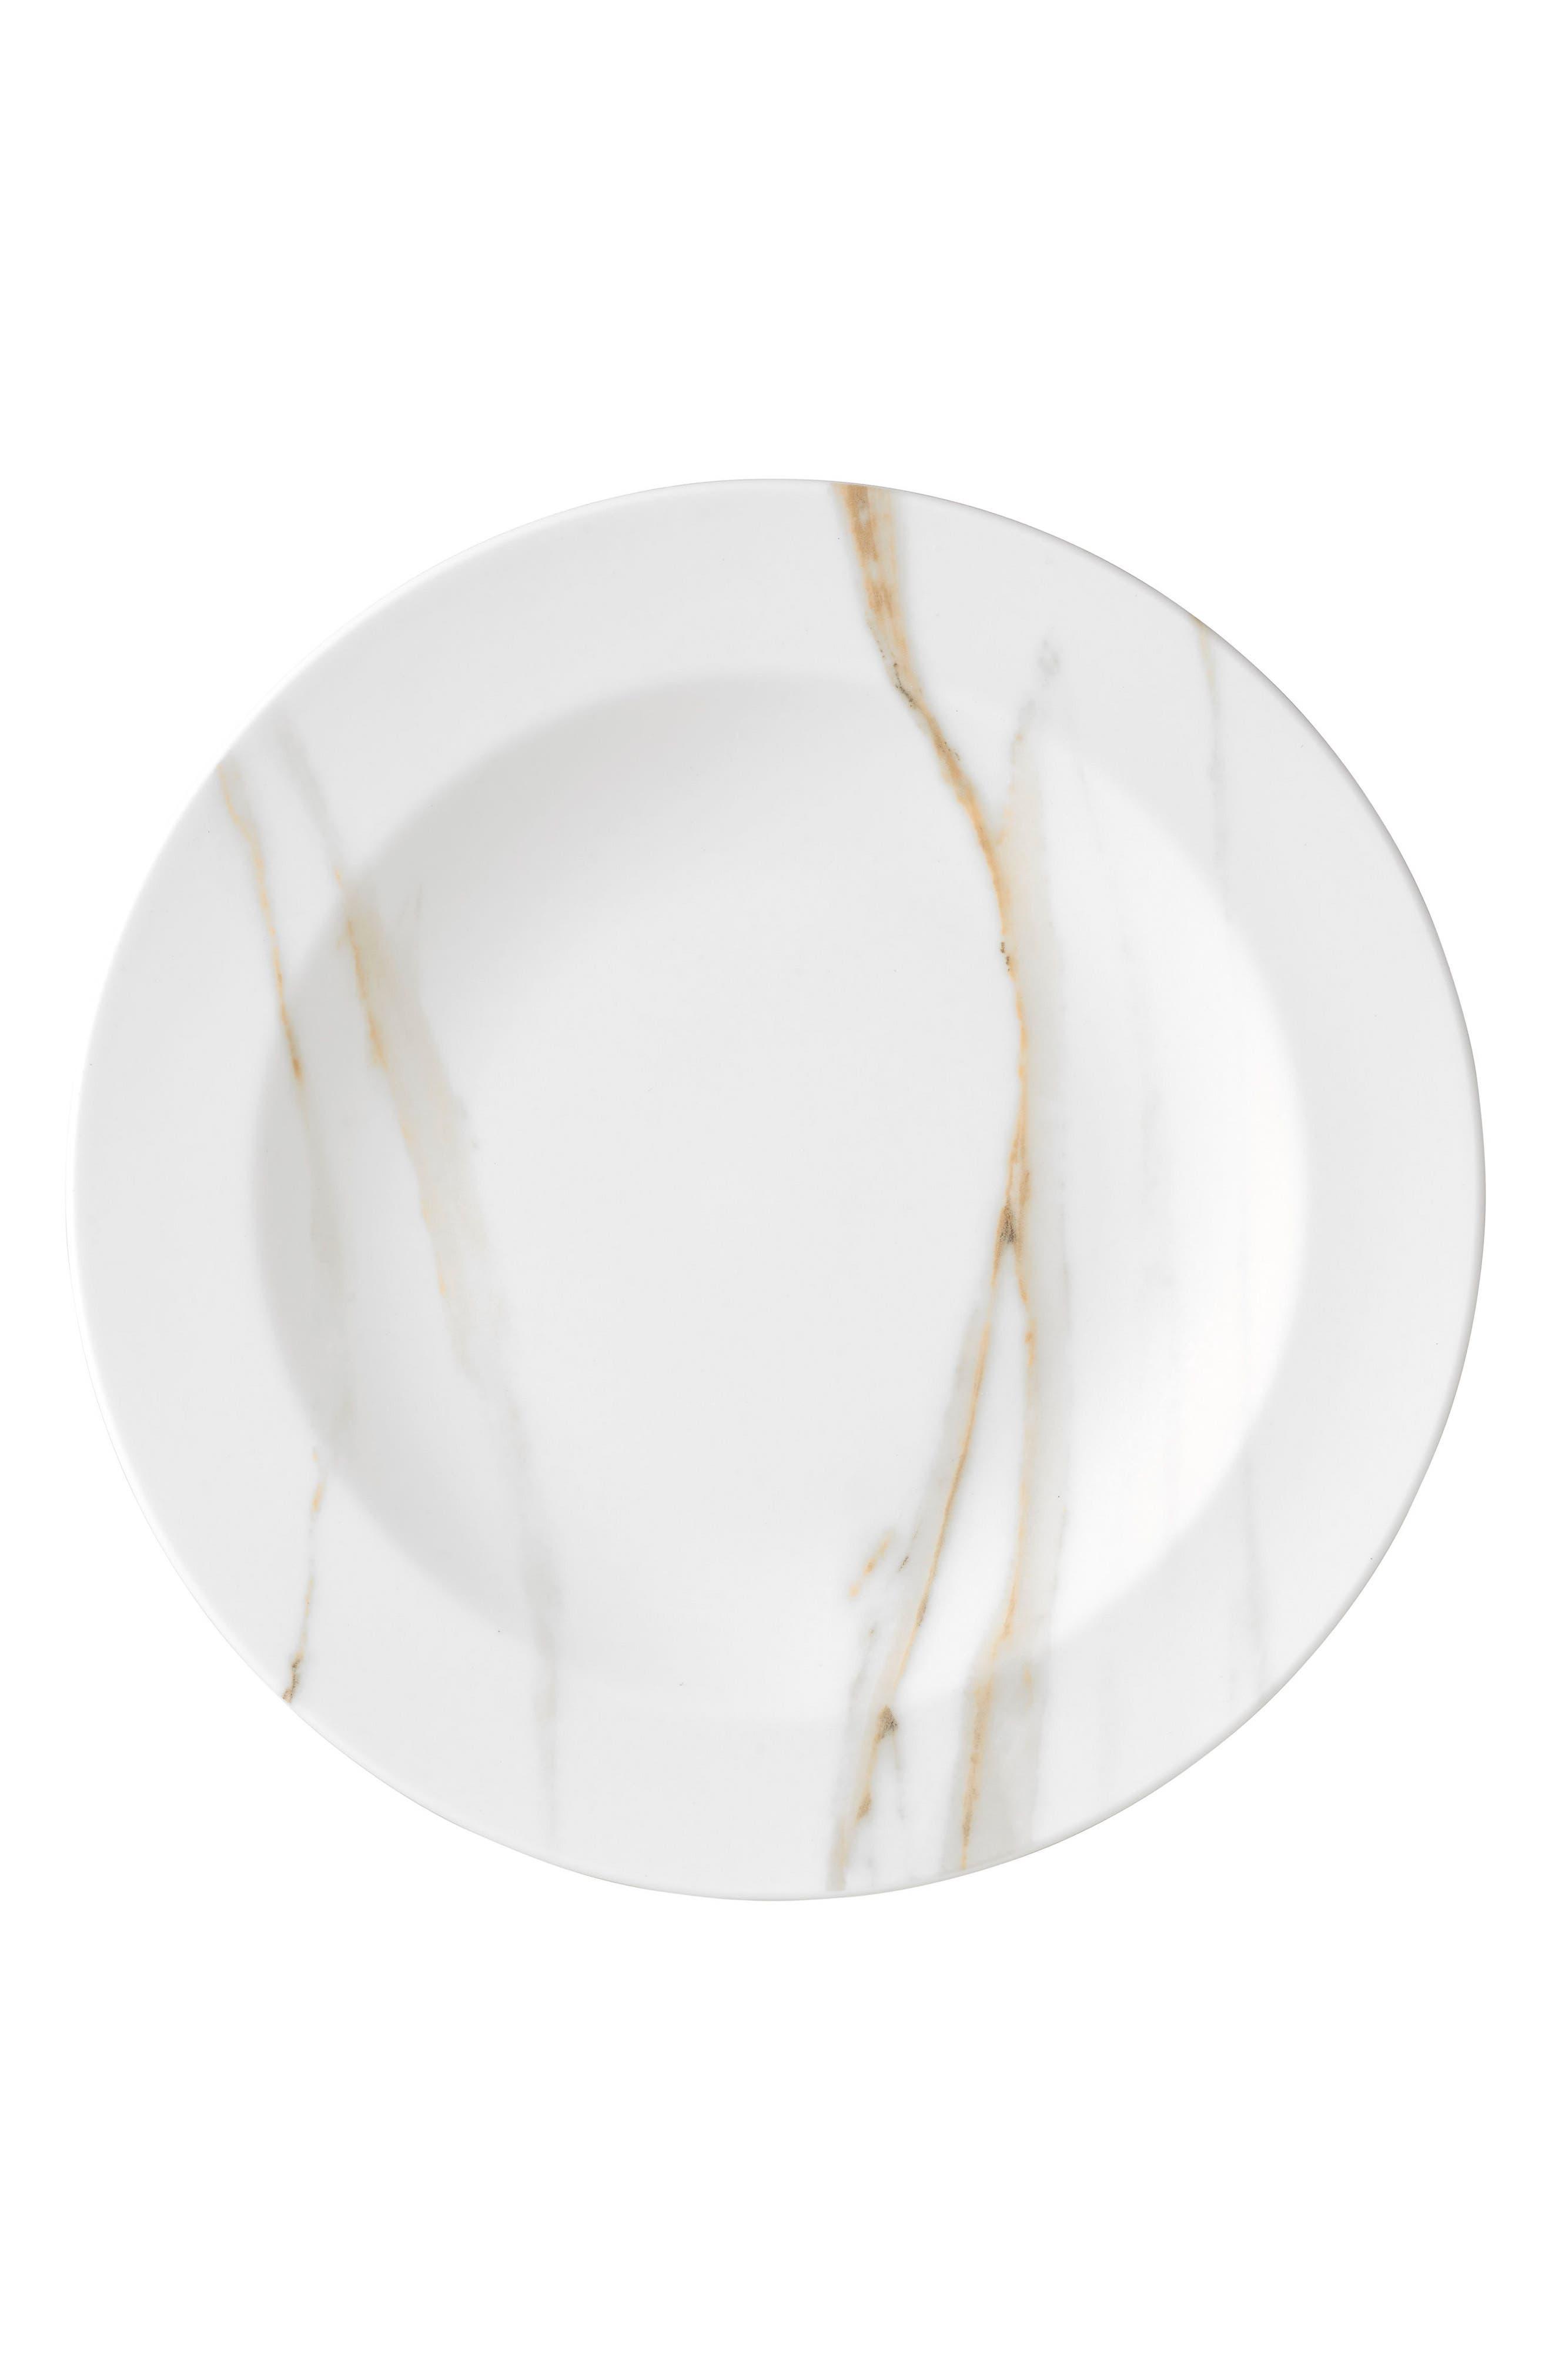 x Wedgwood Venato Imperial Rim Soup Bowl,                             Main thumbnail 1, color,                             White